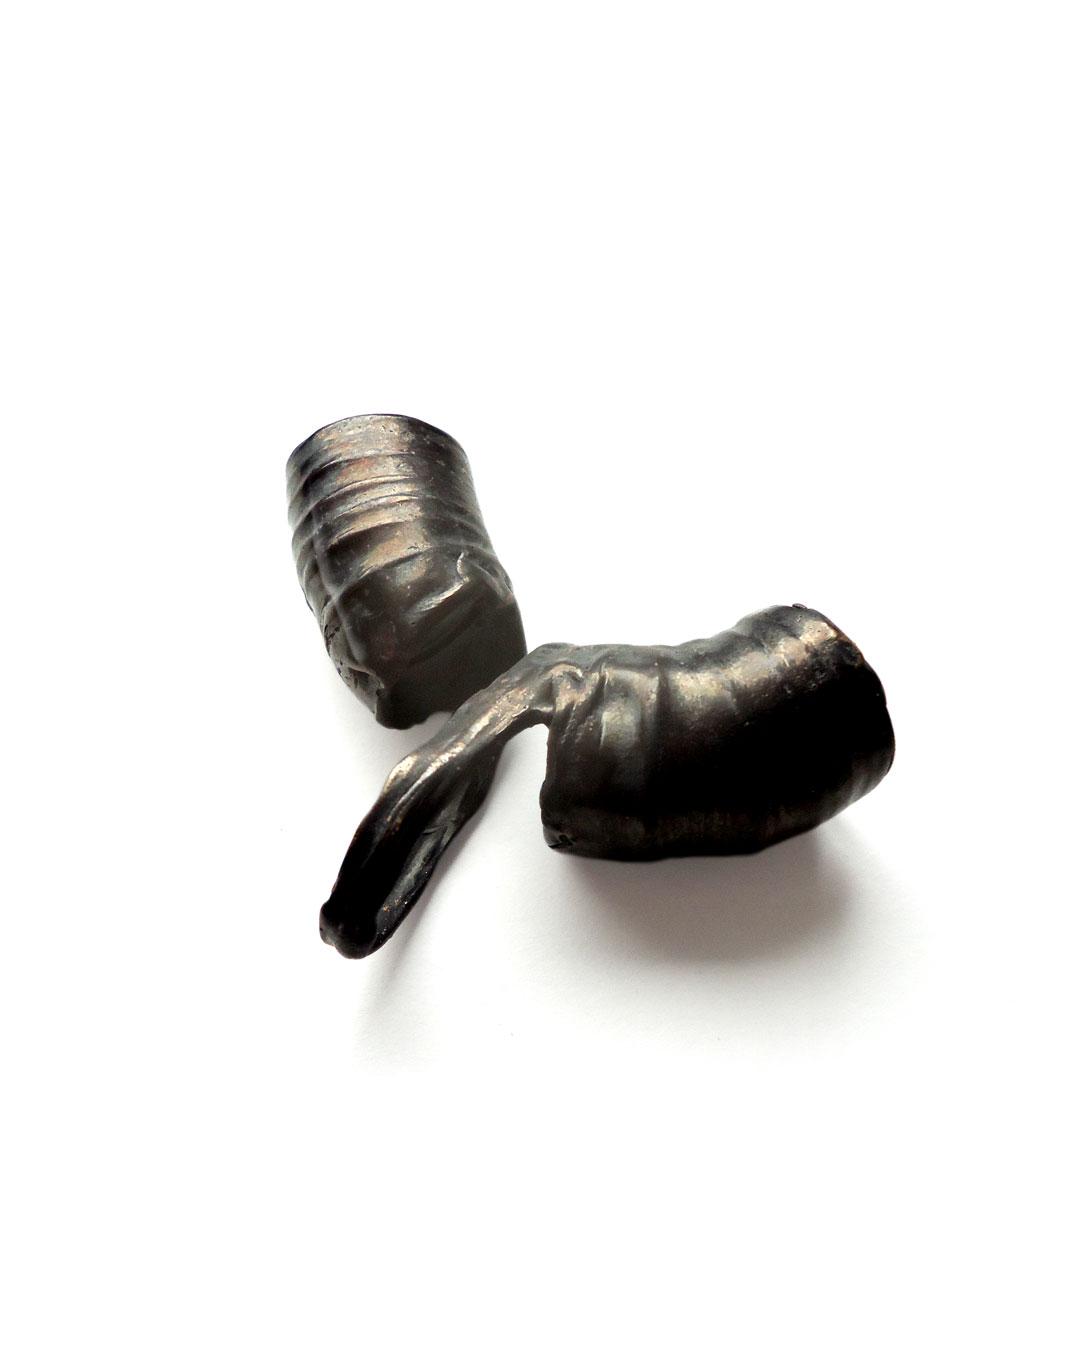 Dana Seachuga, Rebellious-Spring-Ring 5, 2015, ring; bronze, iron, 70 x 50 x 20 mm, €395